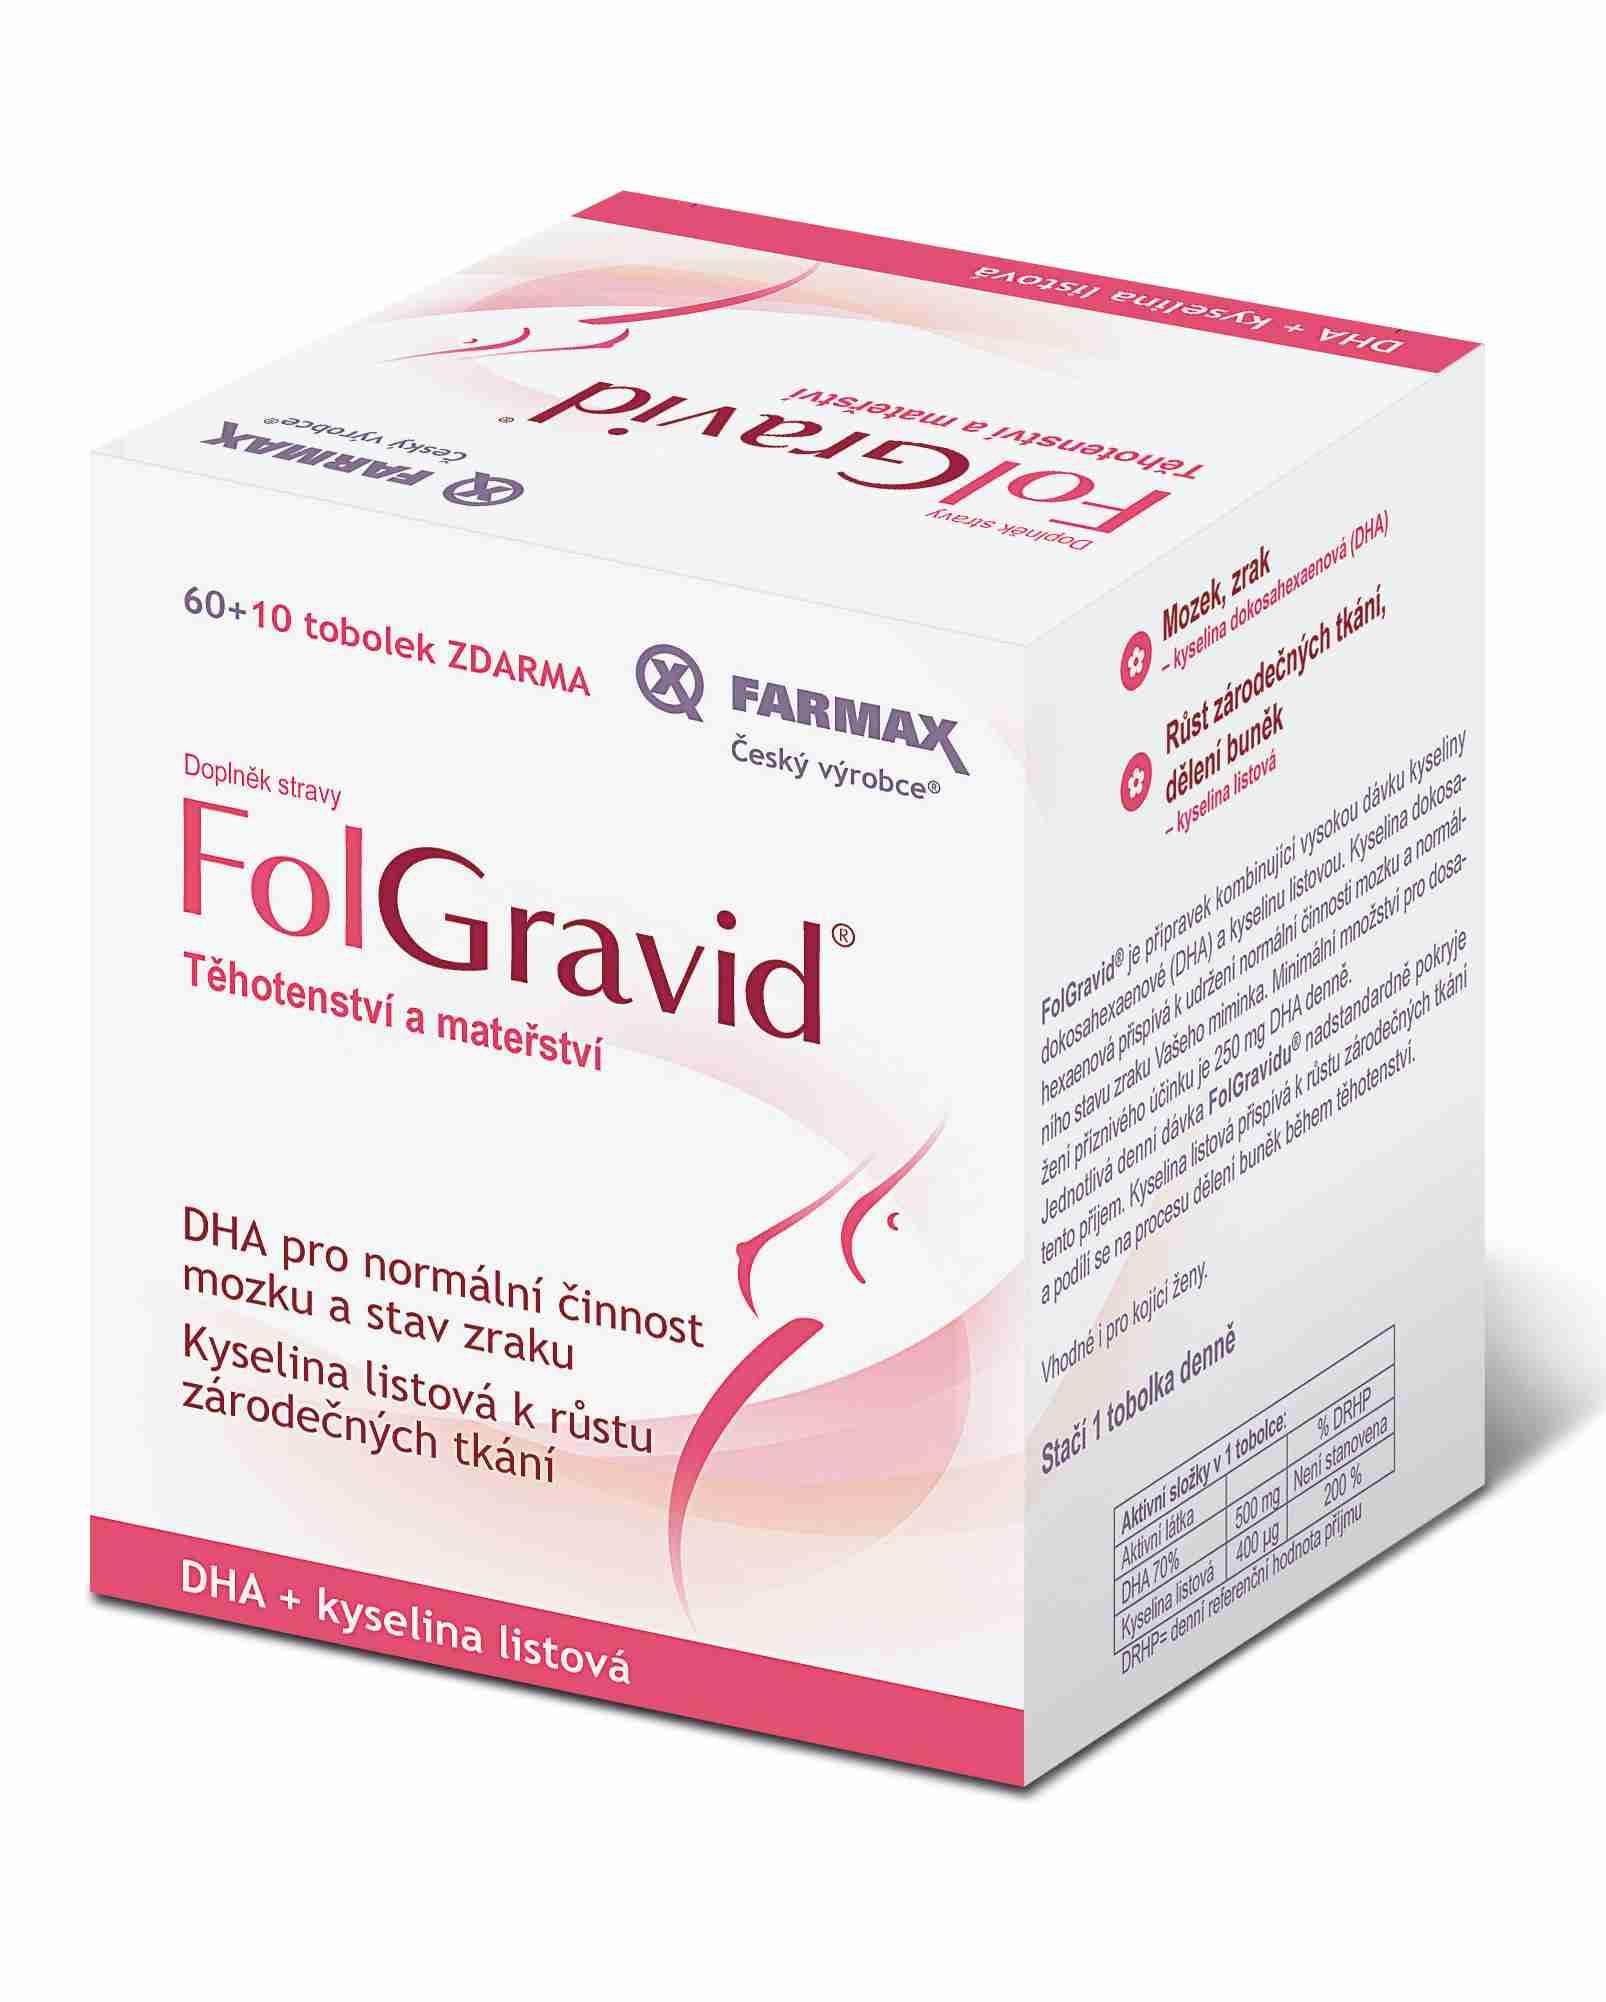 Farmax Folgravid 60 tob. + 10. tob. ZDARMA